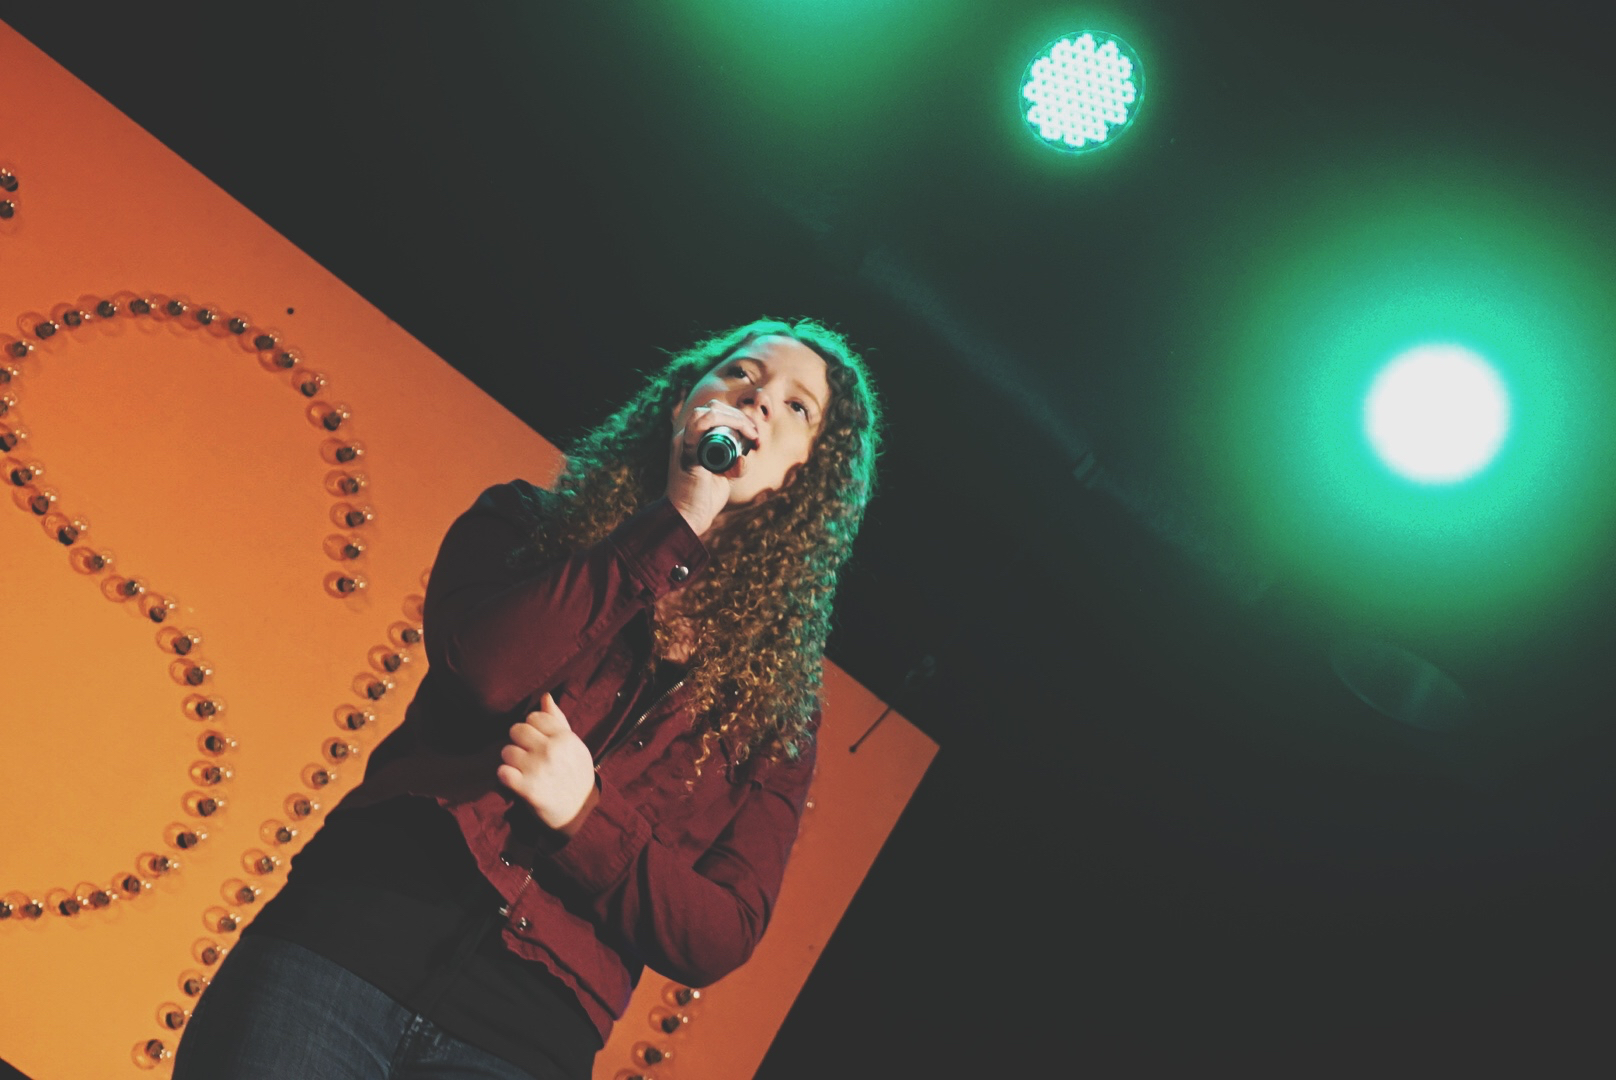 Jess Angelique